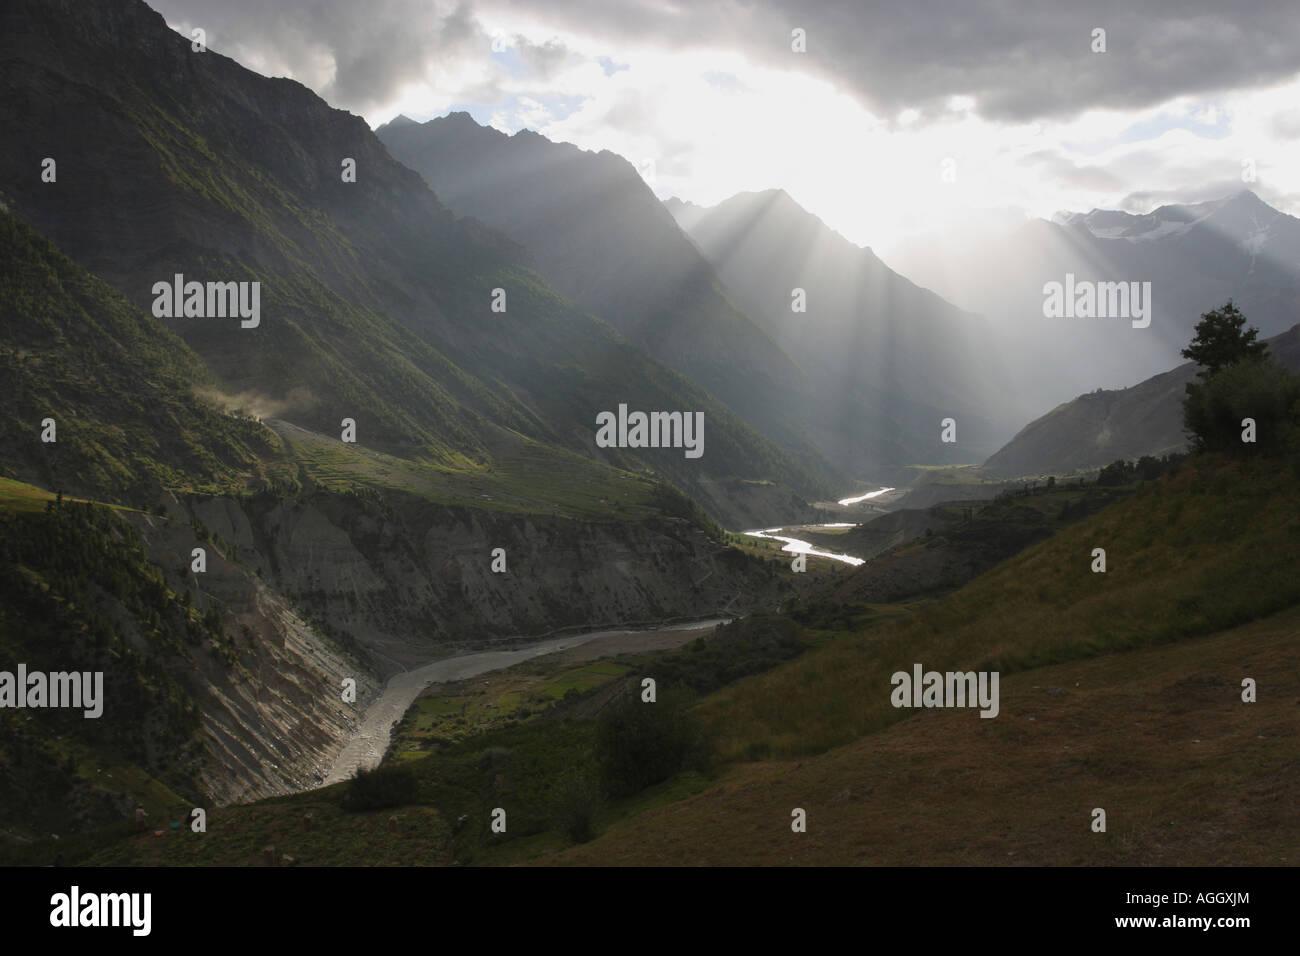 Mountain scenery Keylong Northern India - Stock Image